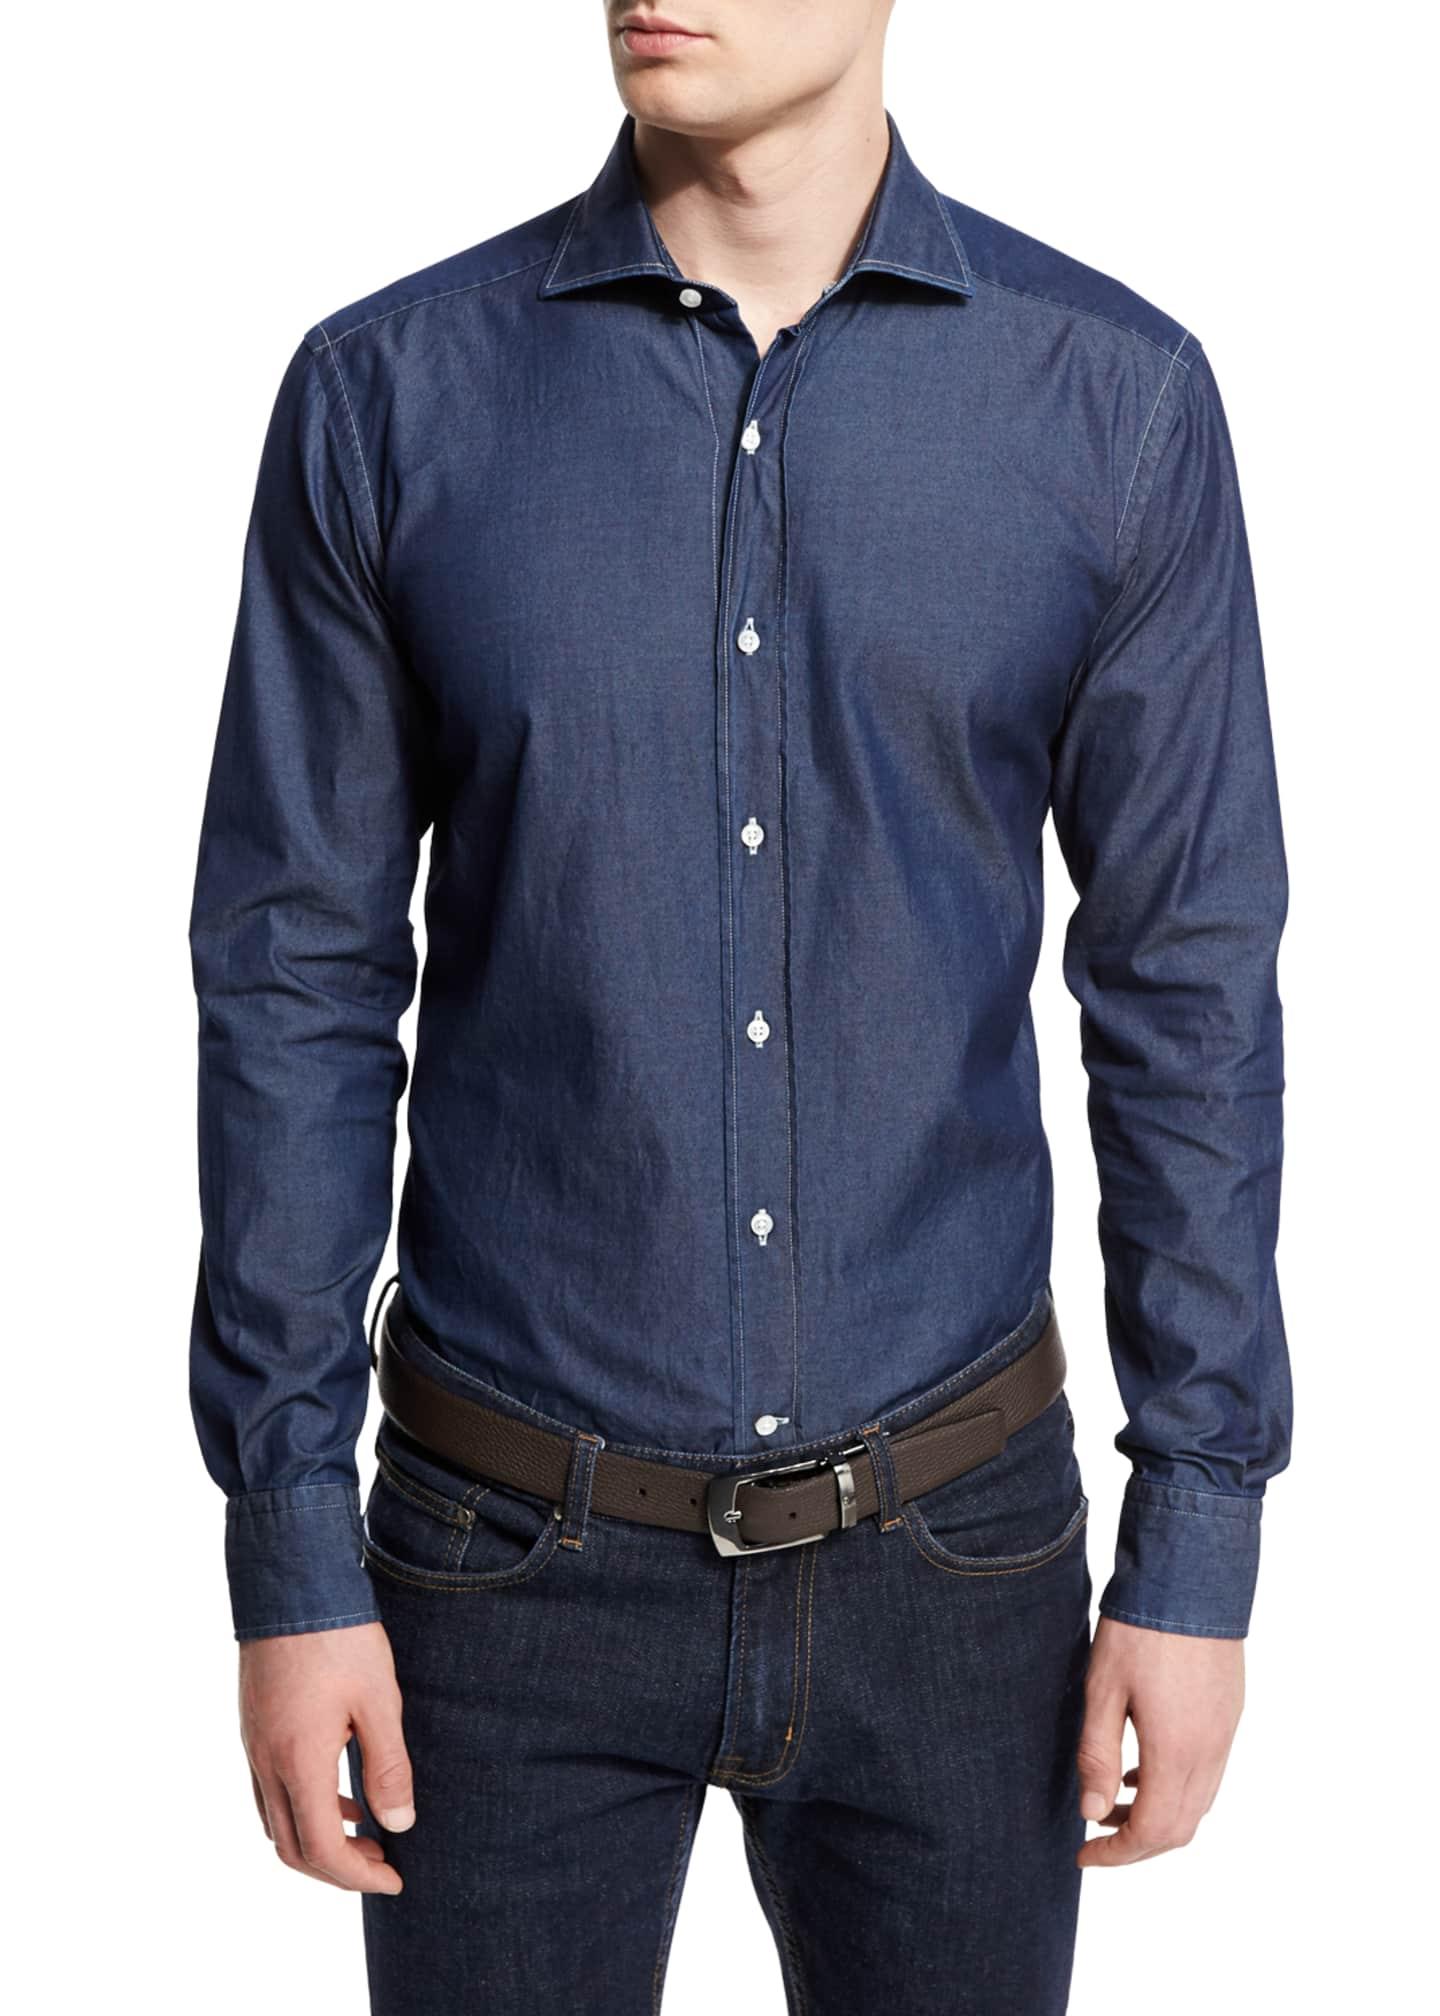 Goodman's Washed Denim Button-Down Shirt, Slate